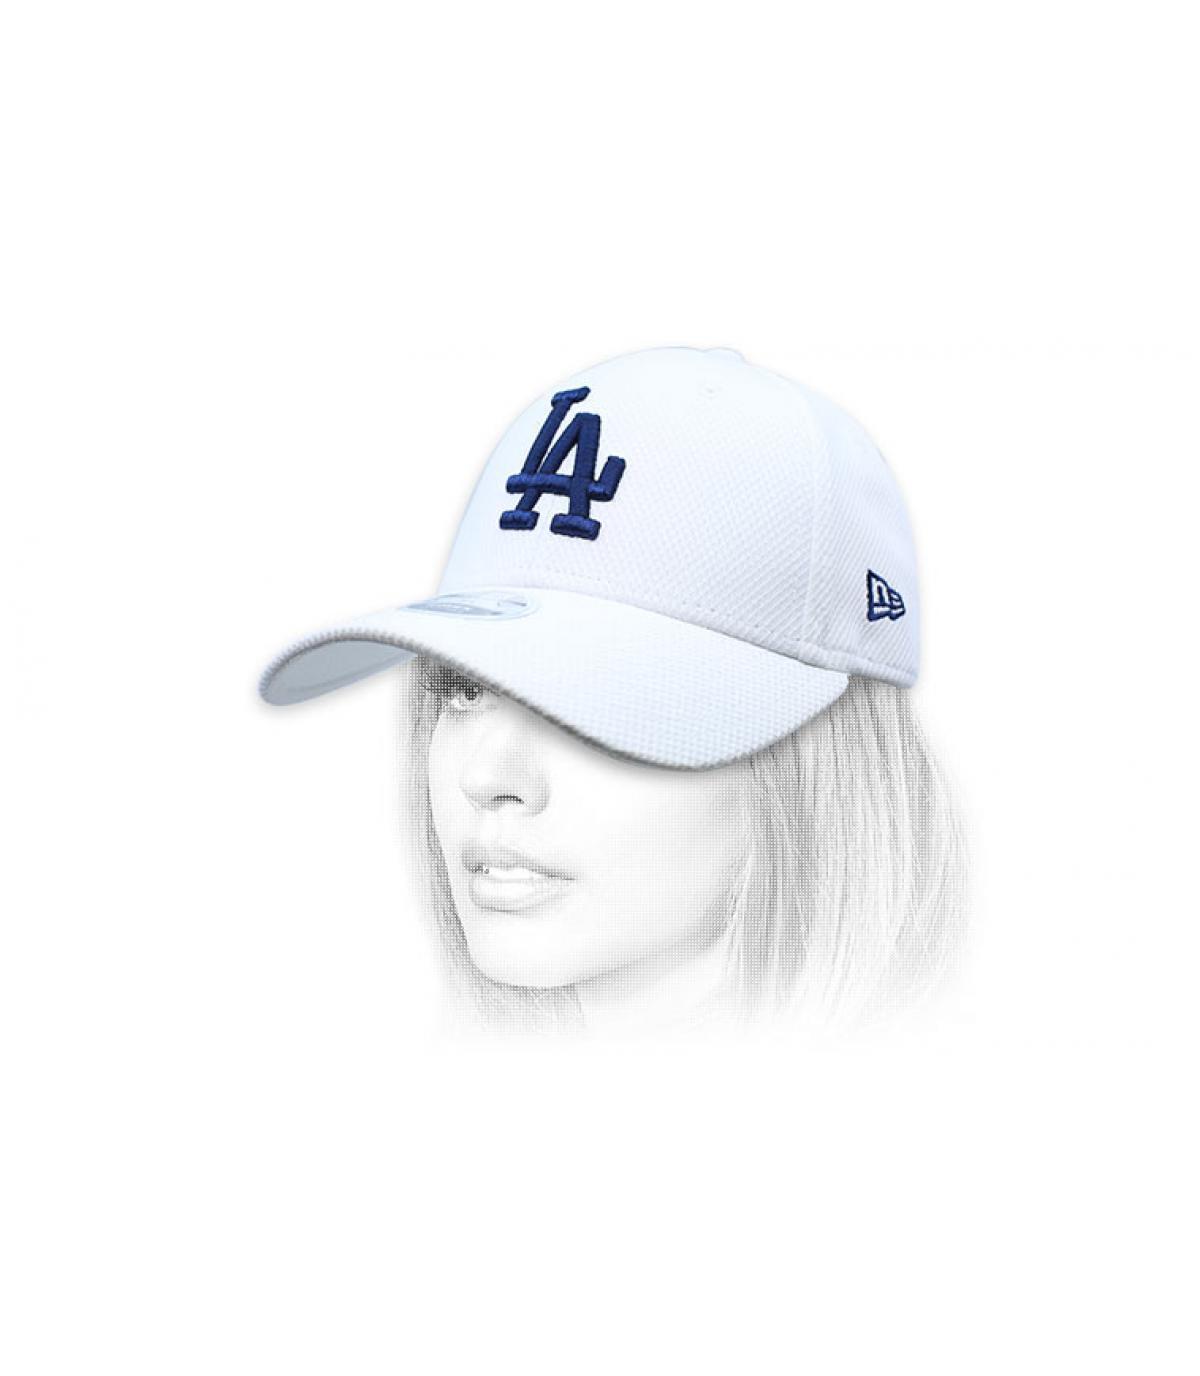 kap LA vrouw wit blauw